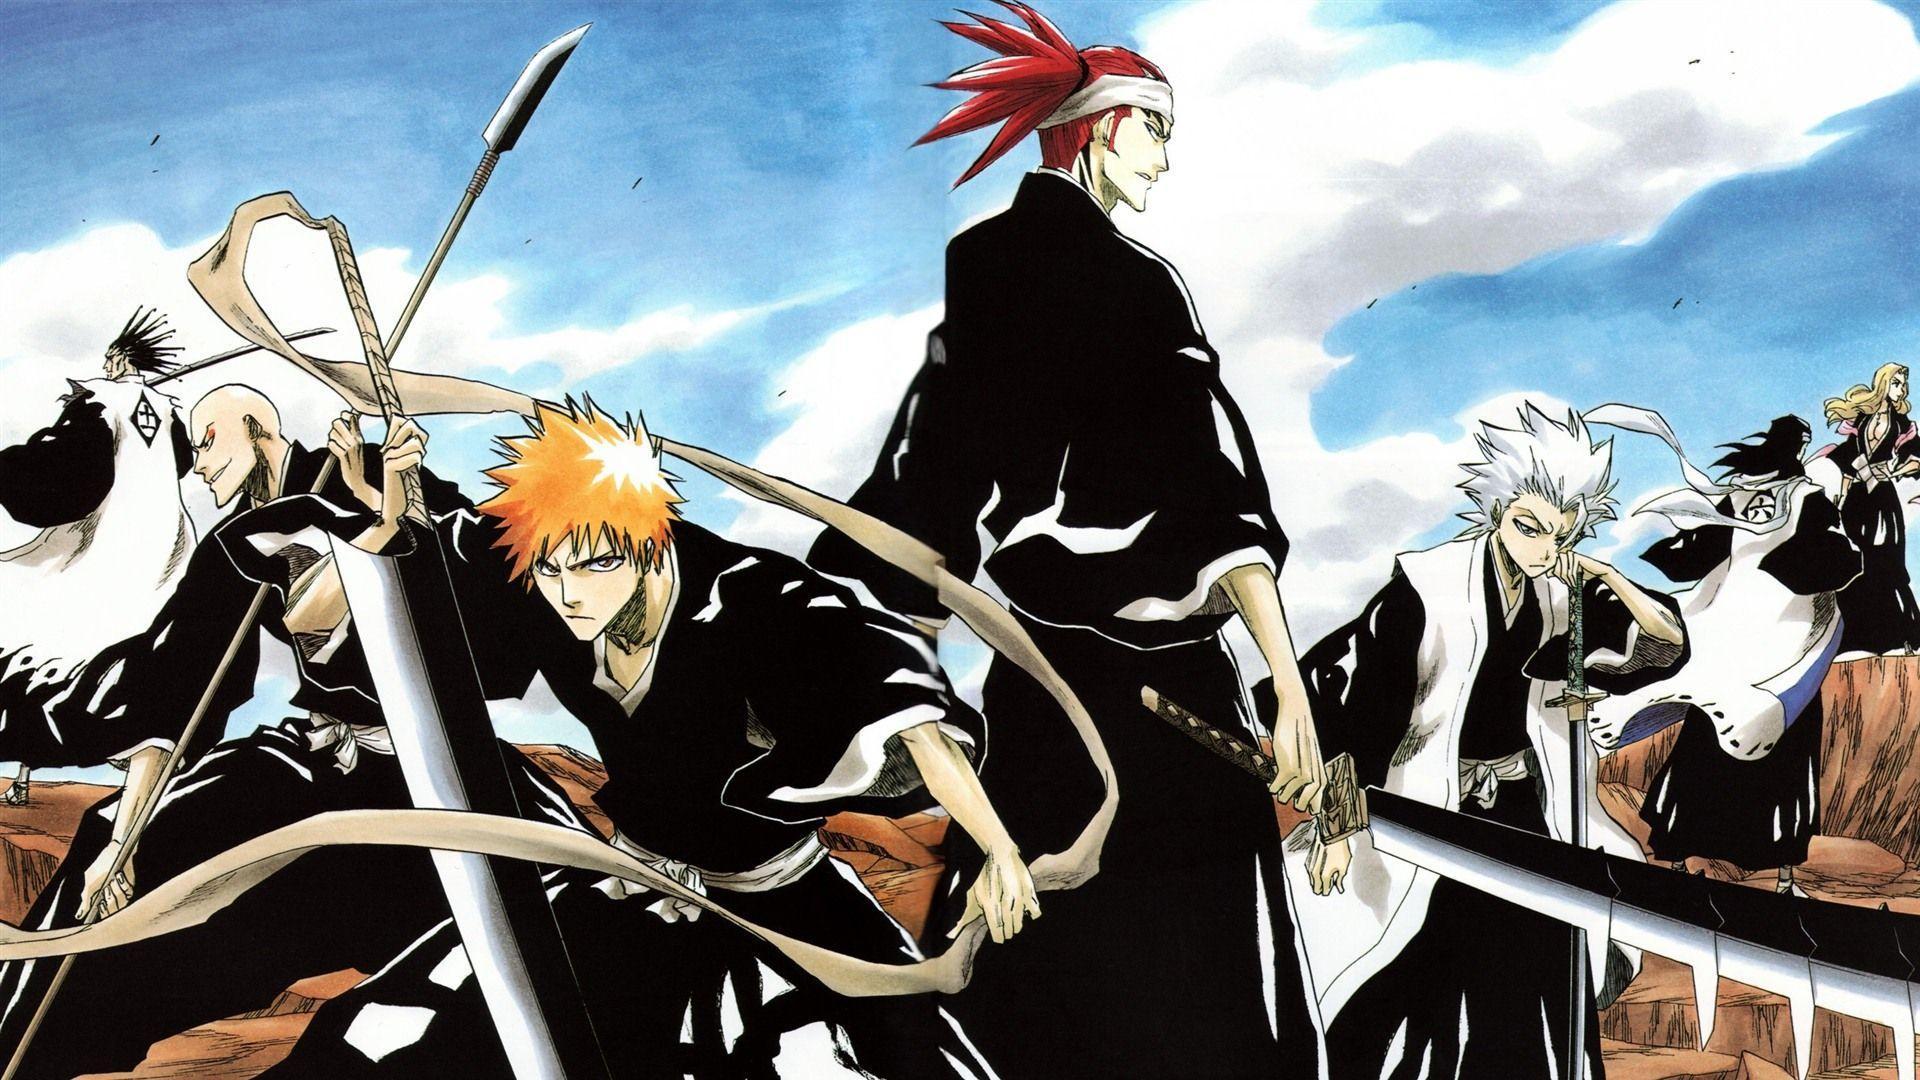 Bleach Manga Wallpapers - Top Free